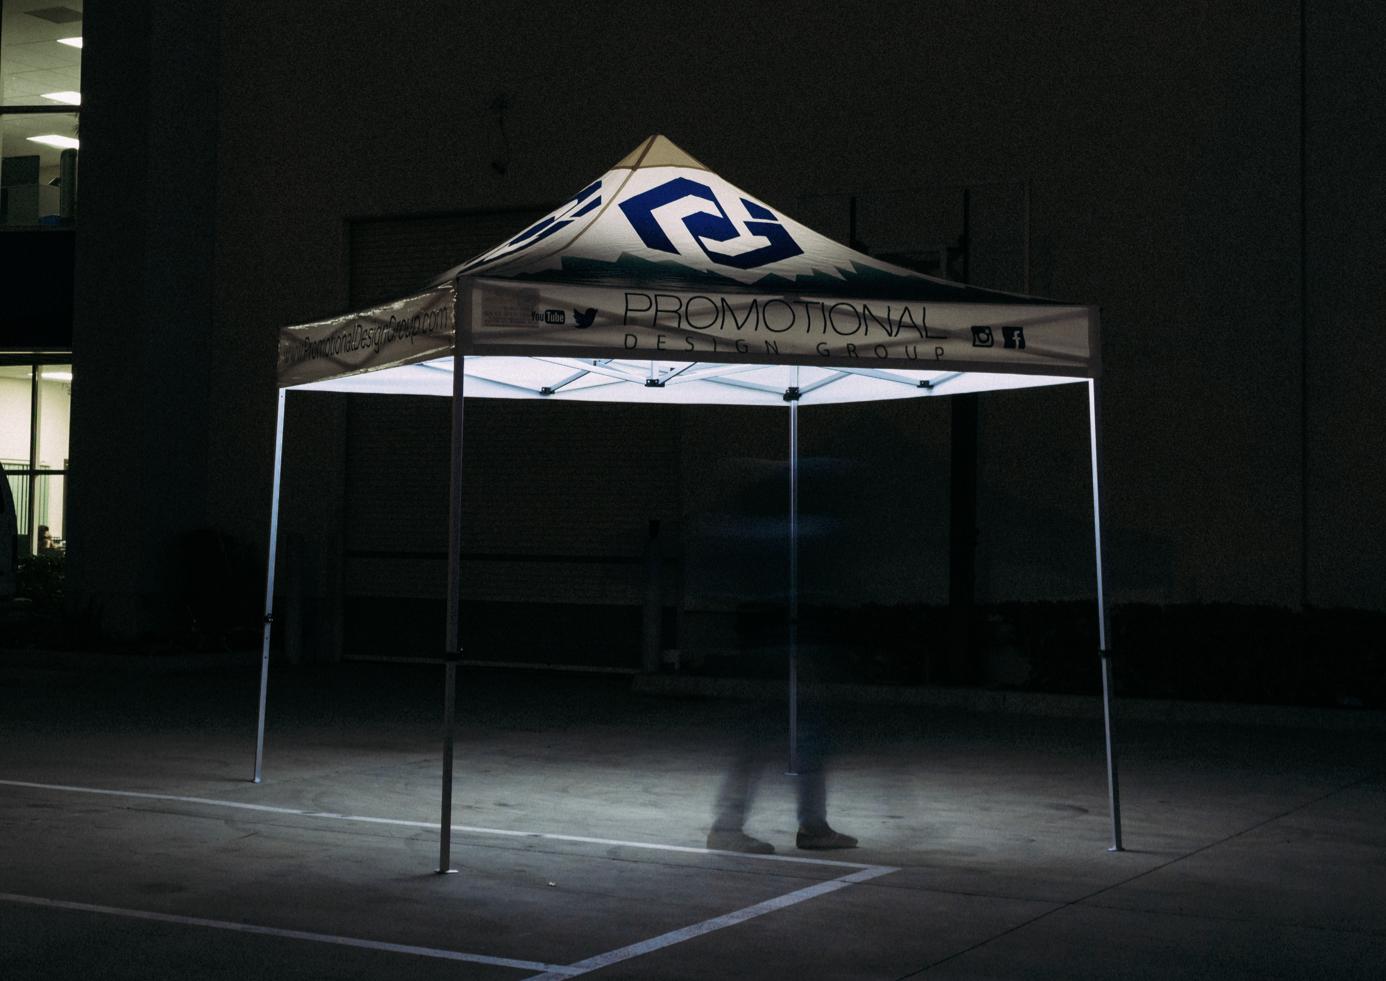 pop up tent lights with an illuminated pop tent